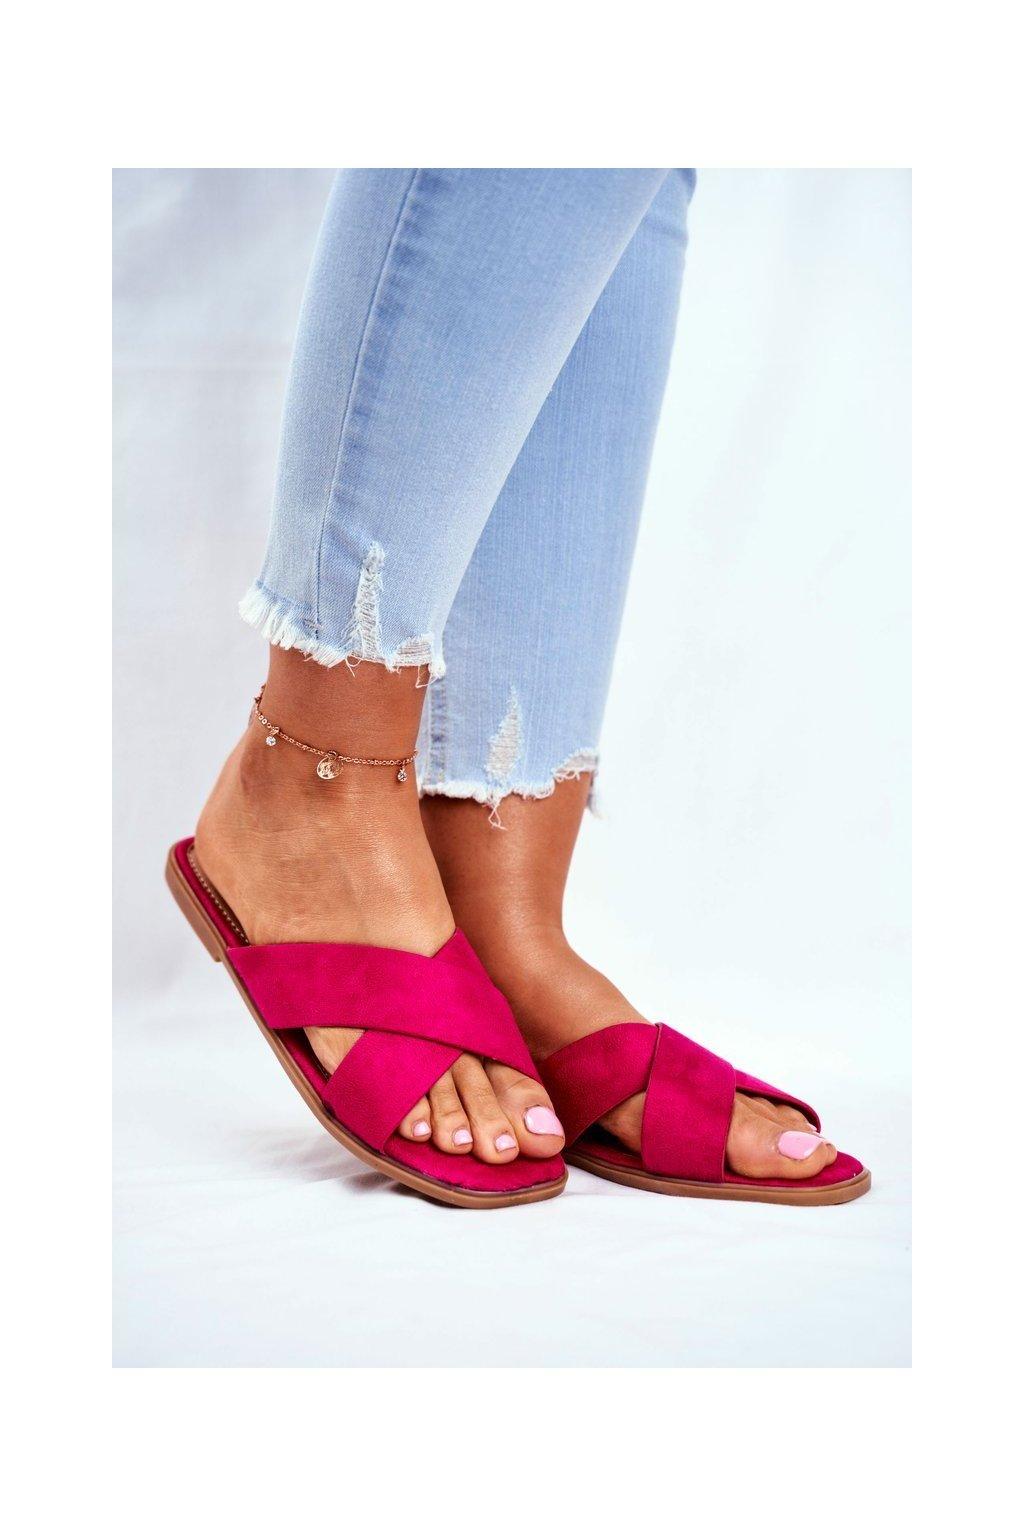 Ružová obuv NJSK WL057 FUCHSIA